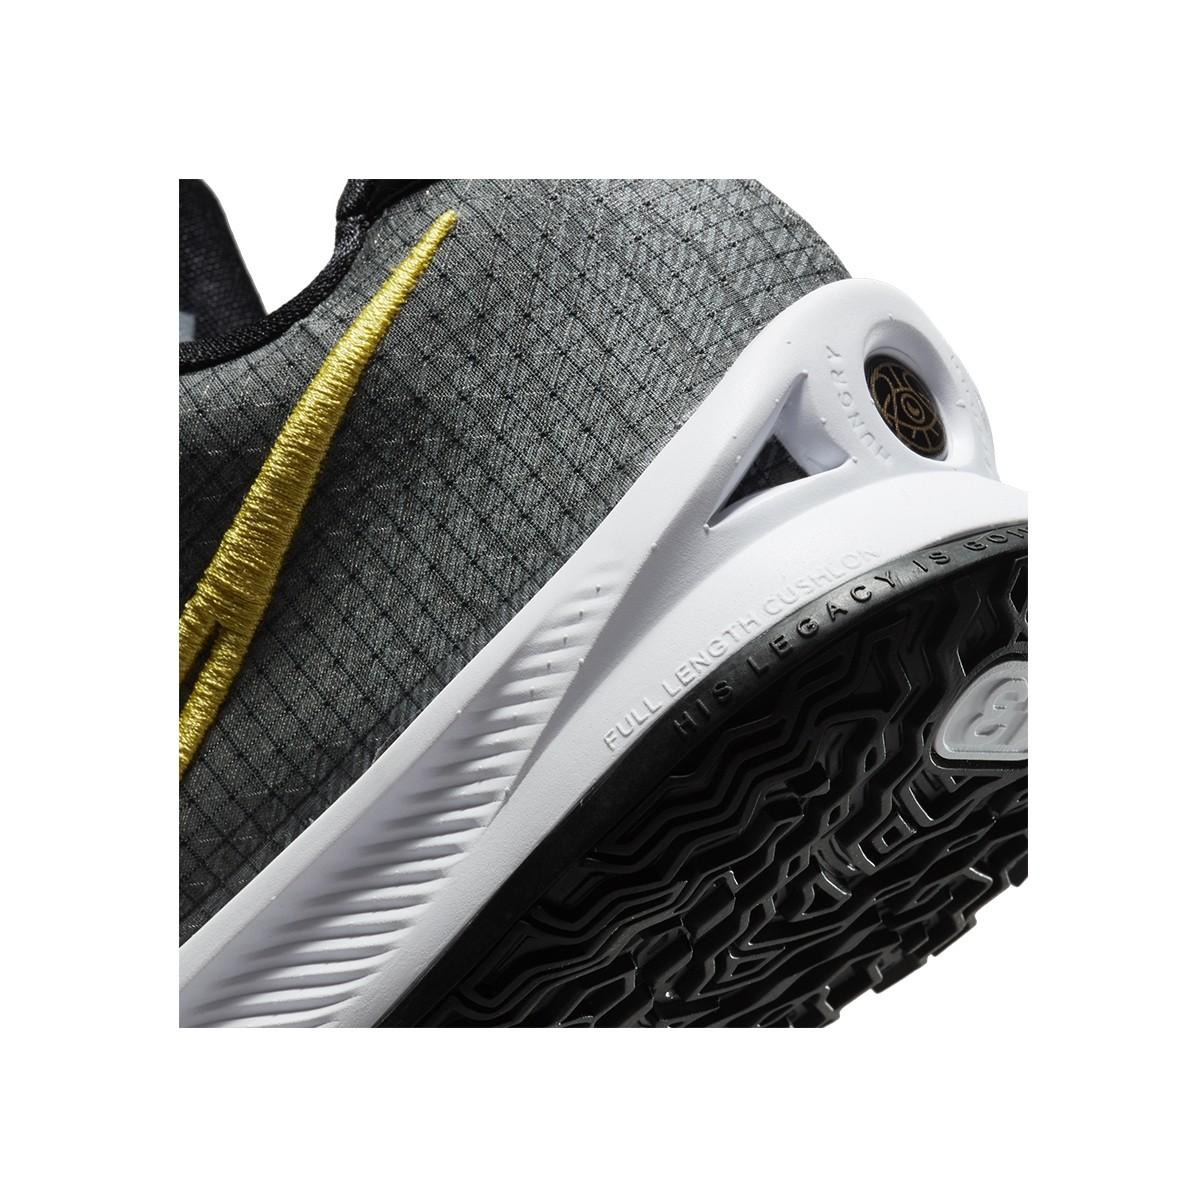 Nike Kyrie Low 4 'Black Gold'-CW3985-001